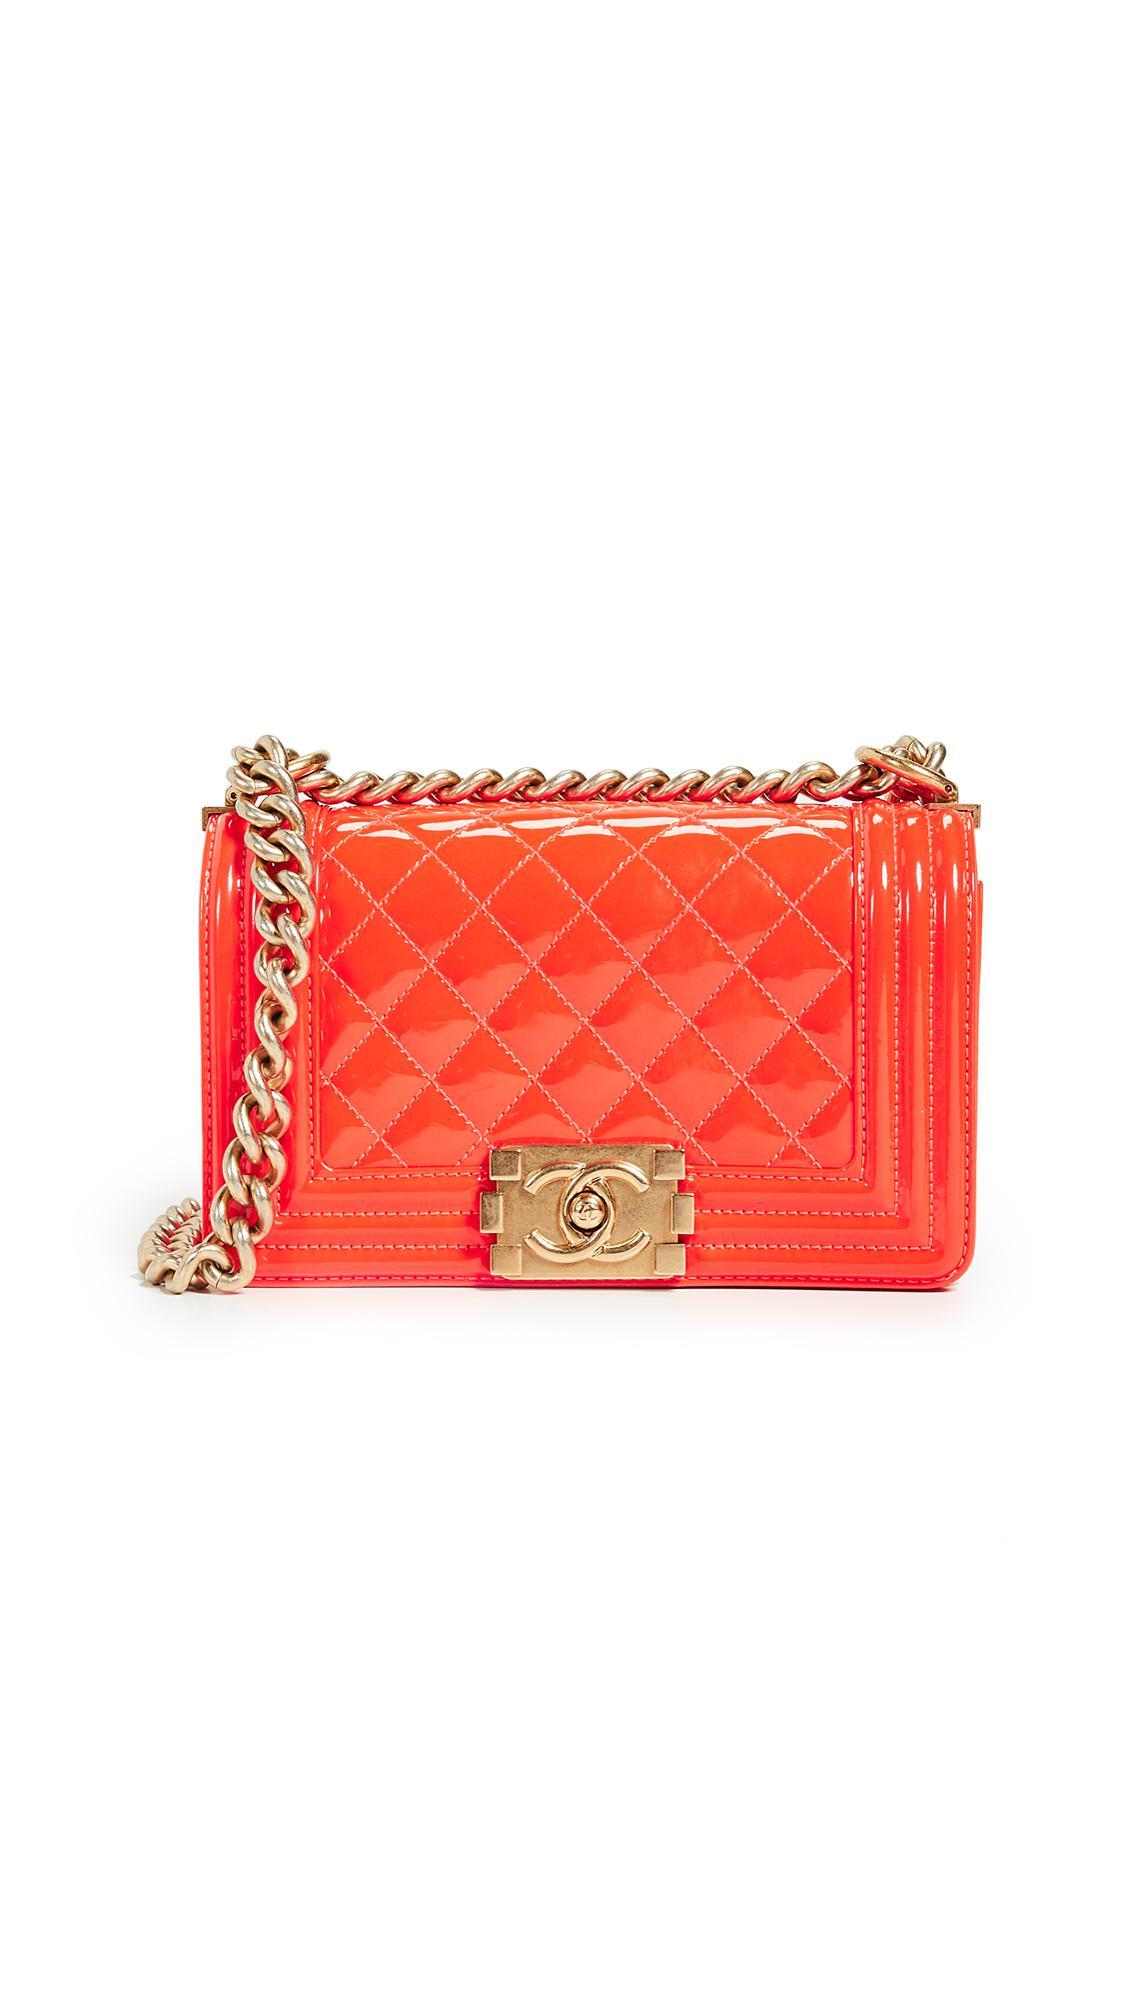 20012e229946 What Goes Around Comes Around Chanel Patent Boy Small Bag in Orange ...